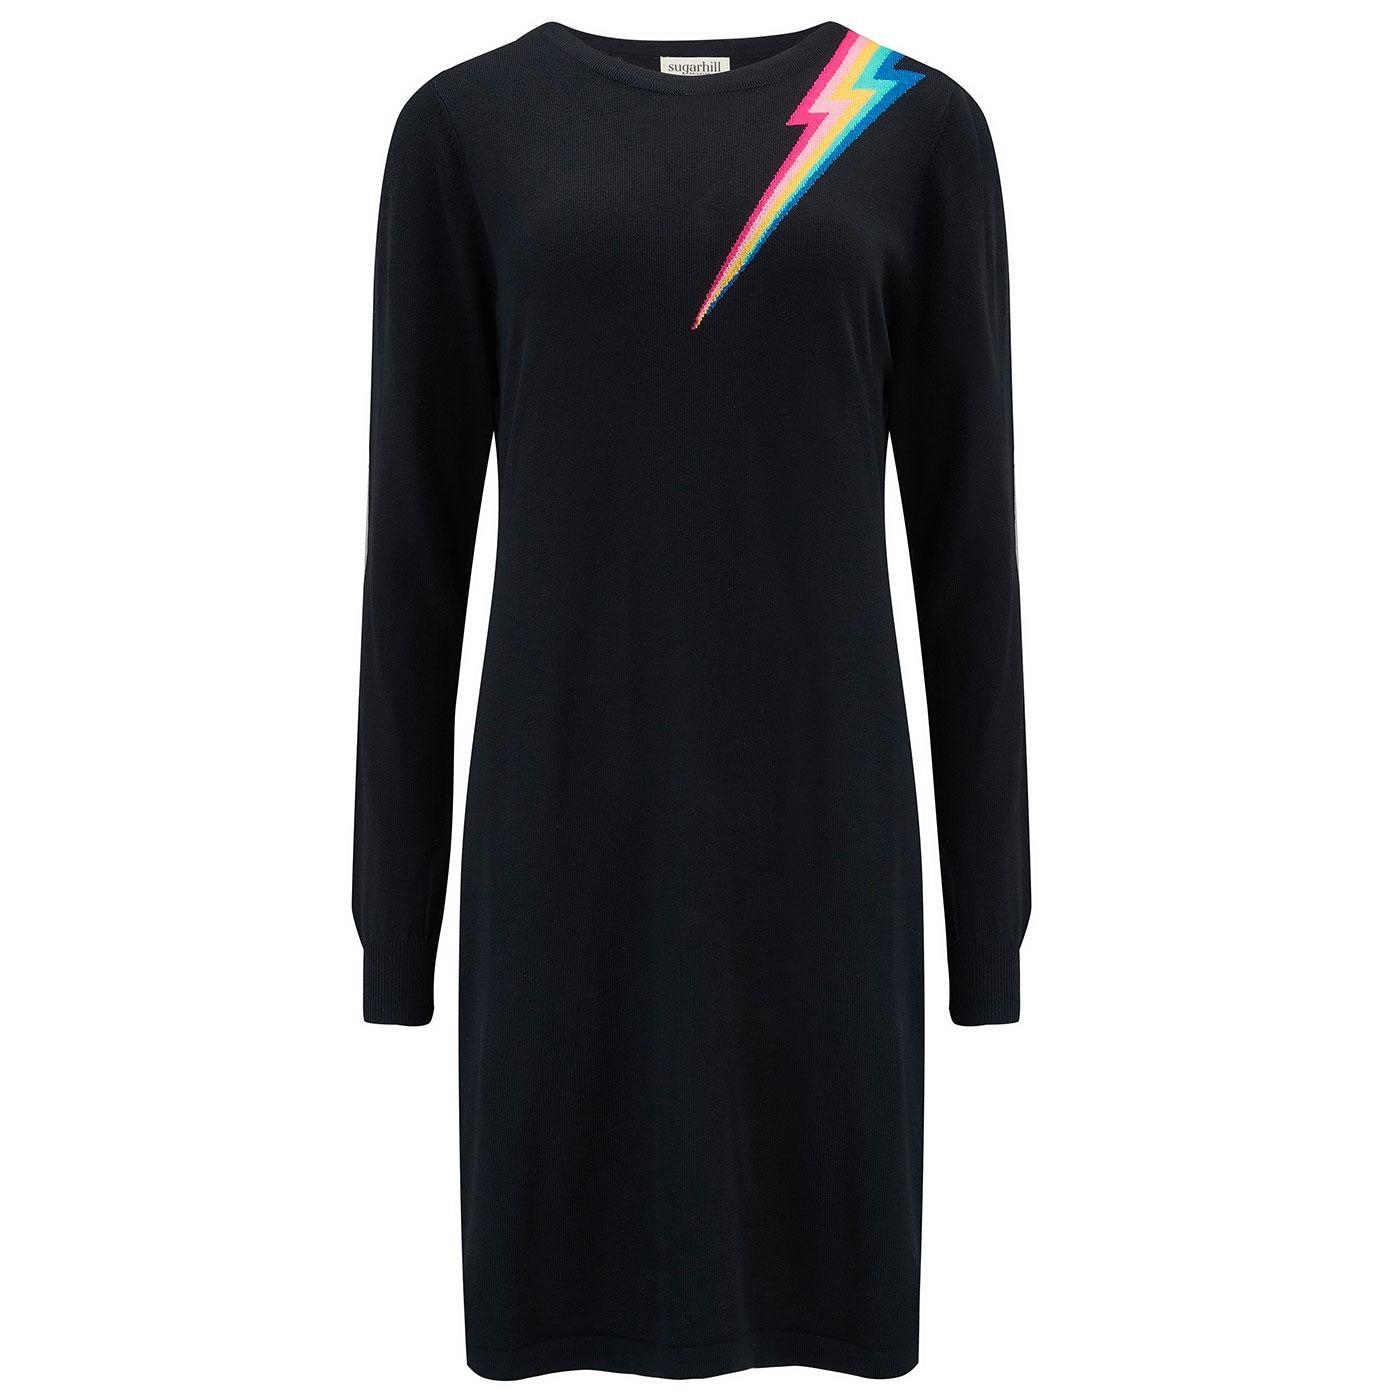 Evie SUGARHILL BRIGHTON Retro Lightning Knit Dress